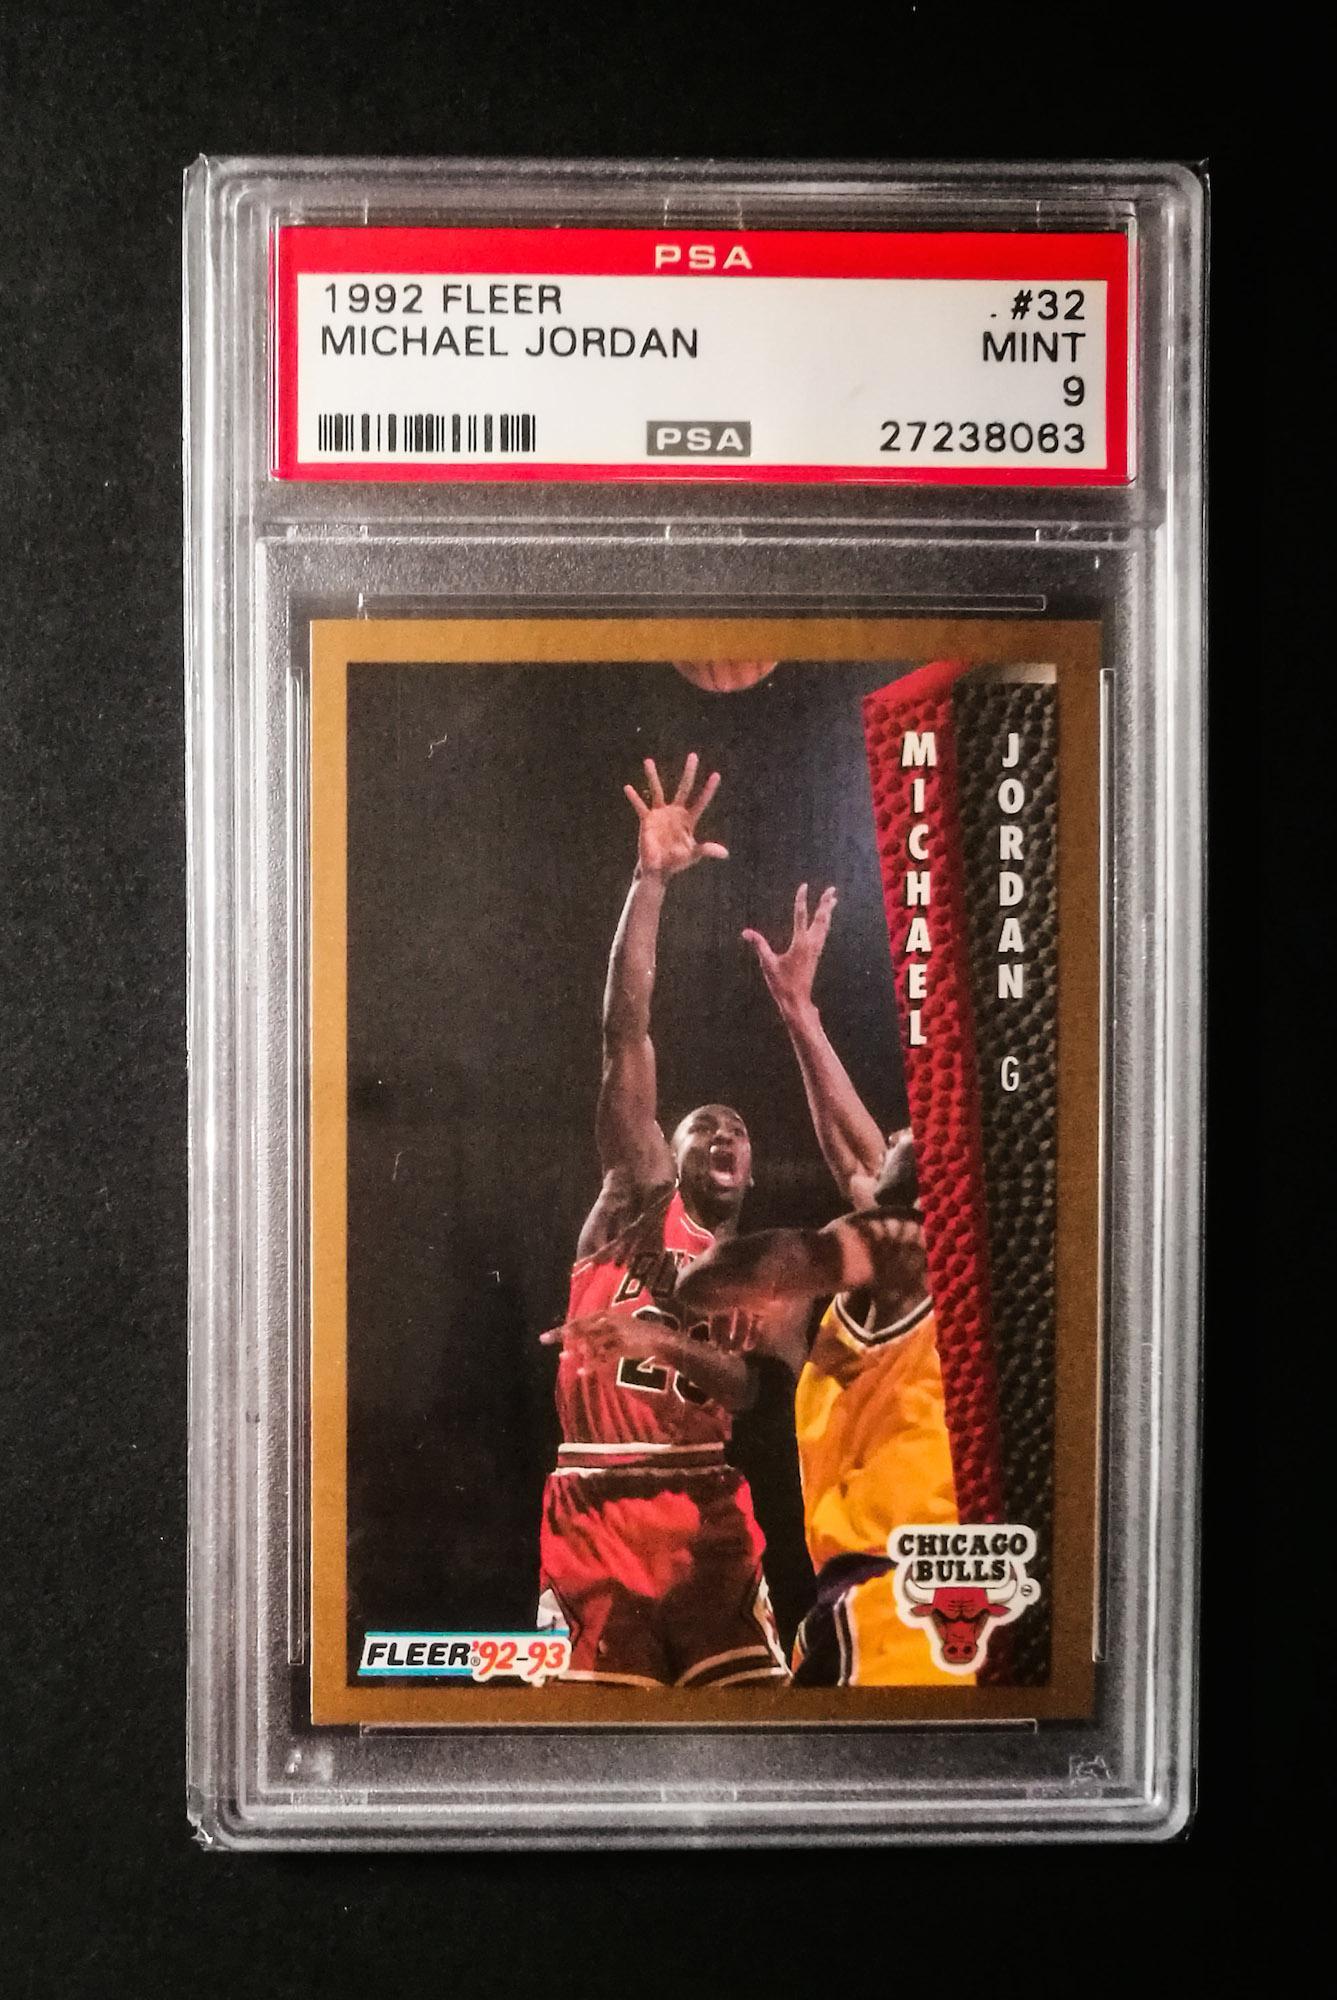 Michael Jordan 1992 93 Fleer 32 PSA 9 MINT Basketball Card